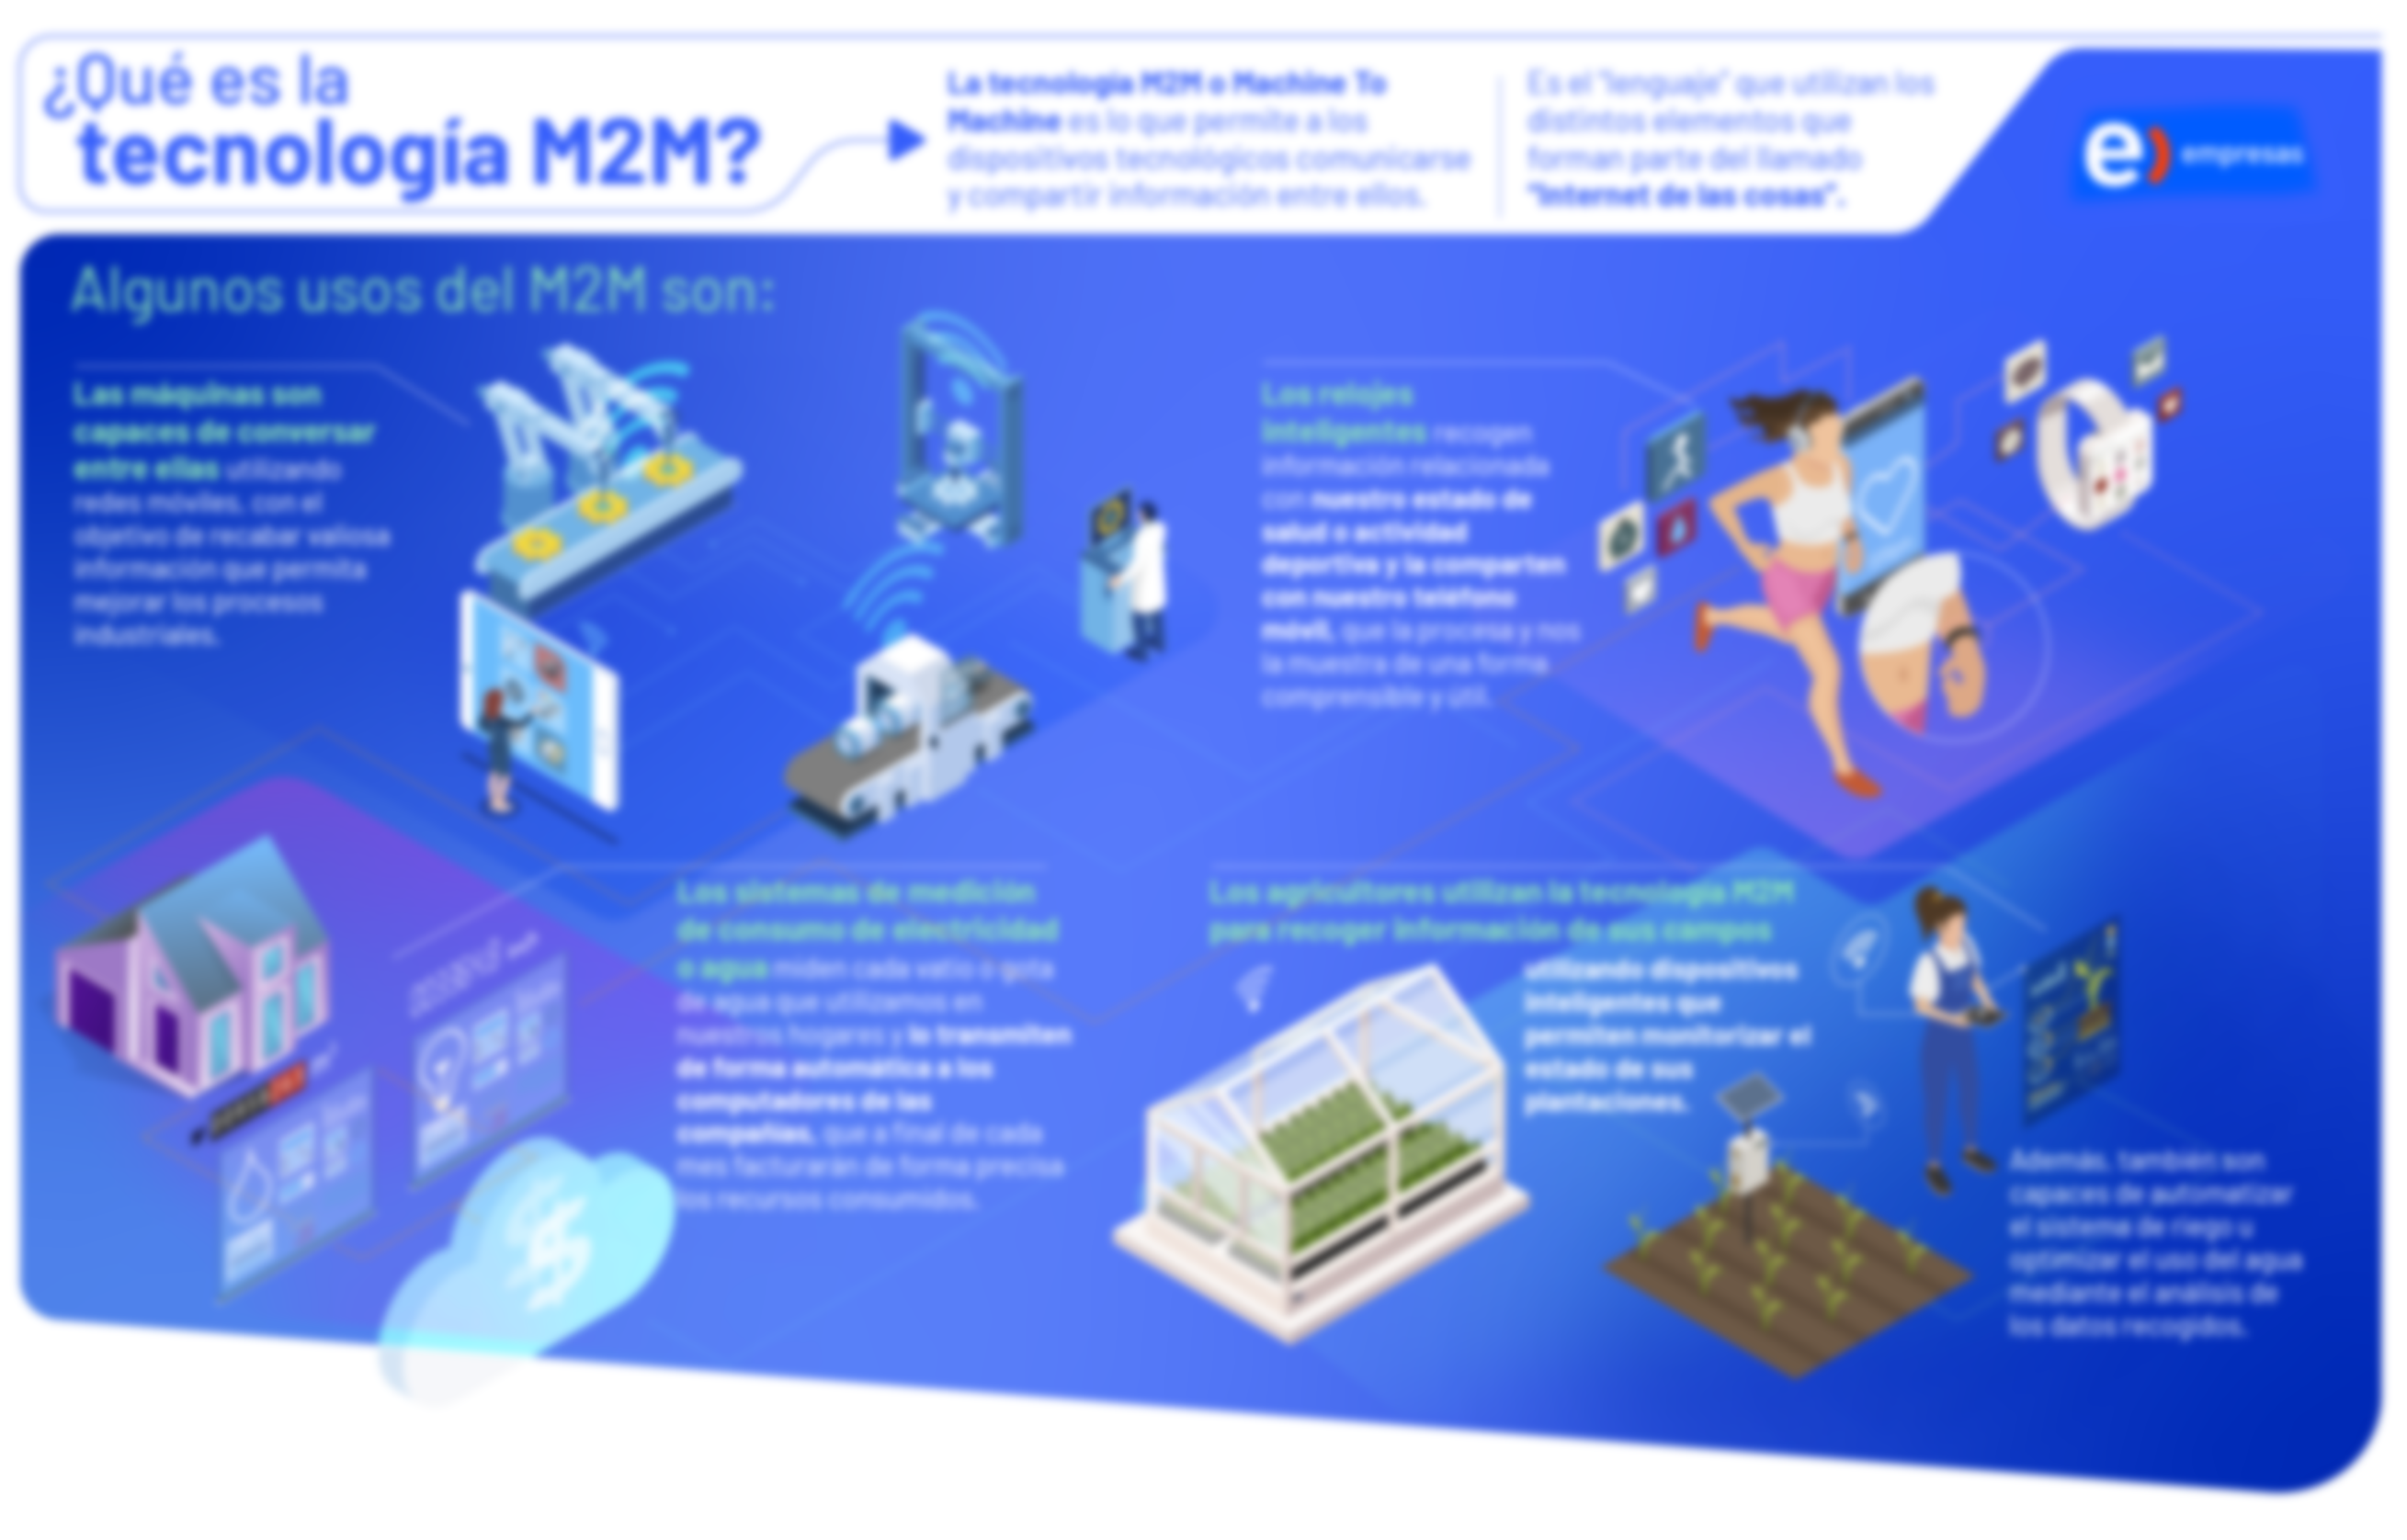 M2M desenfocada-1